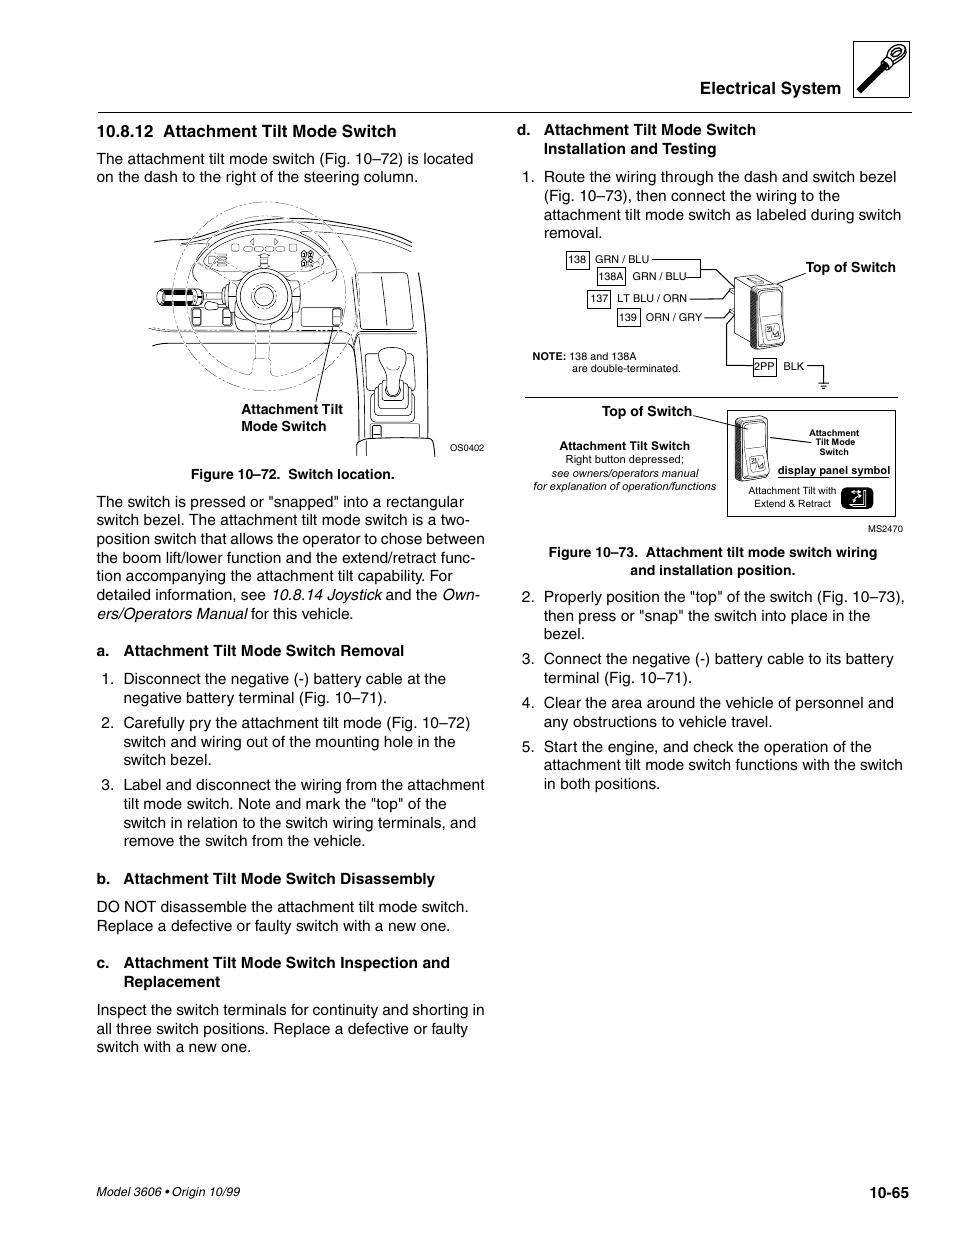 Electrical System 12 Attachment Tilt Mode Switch Skytrak 3606